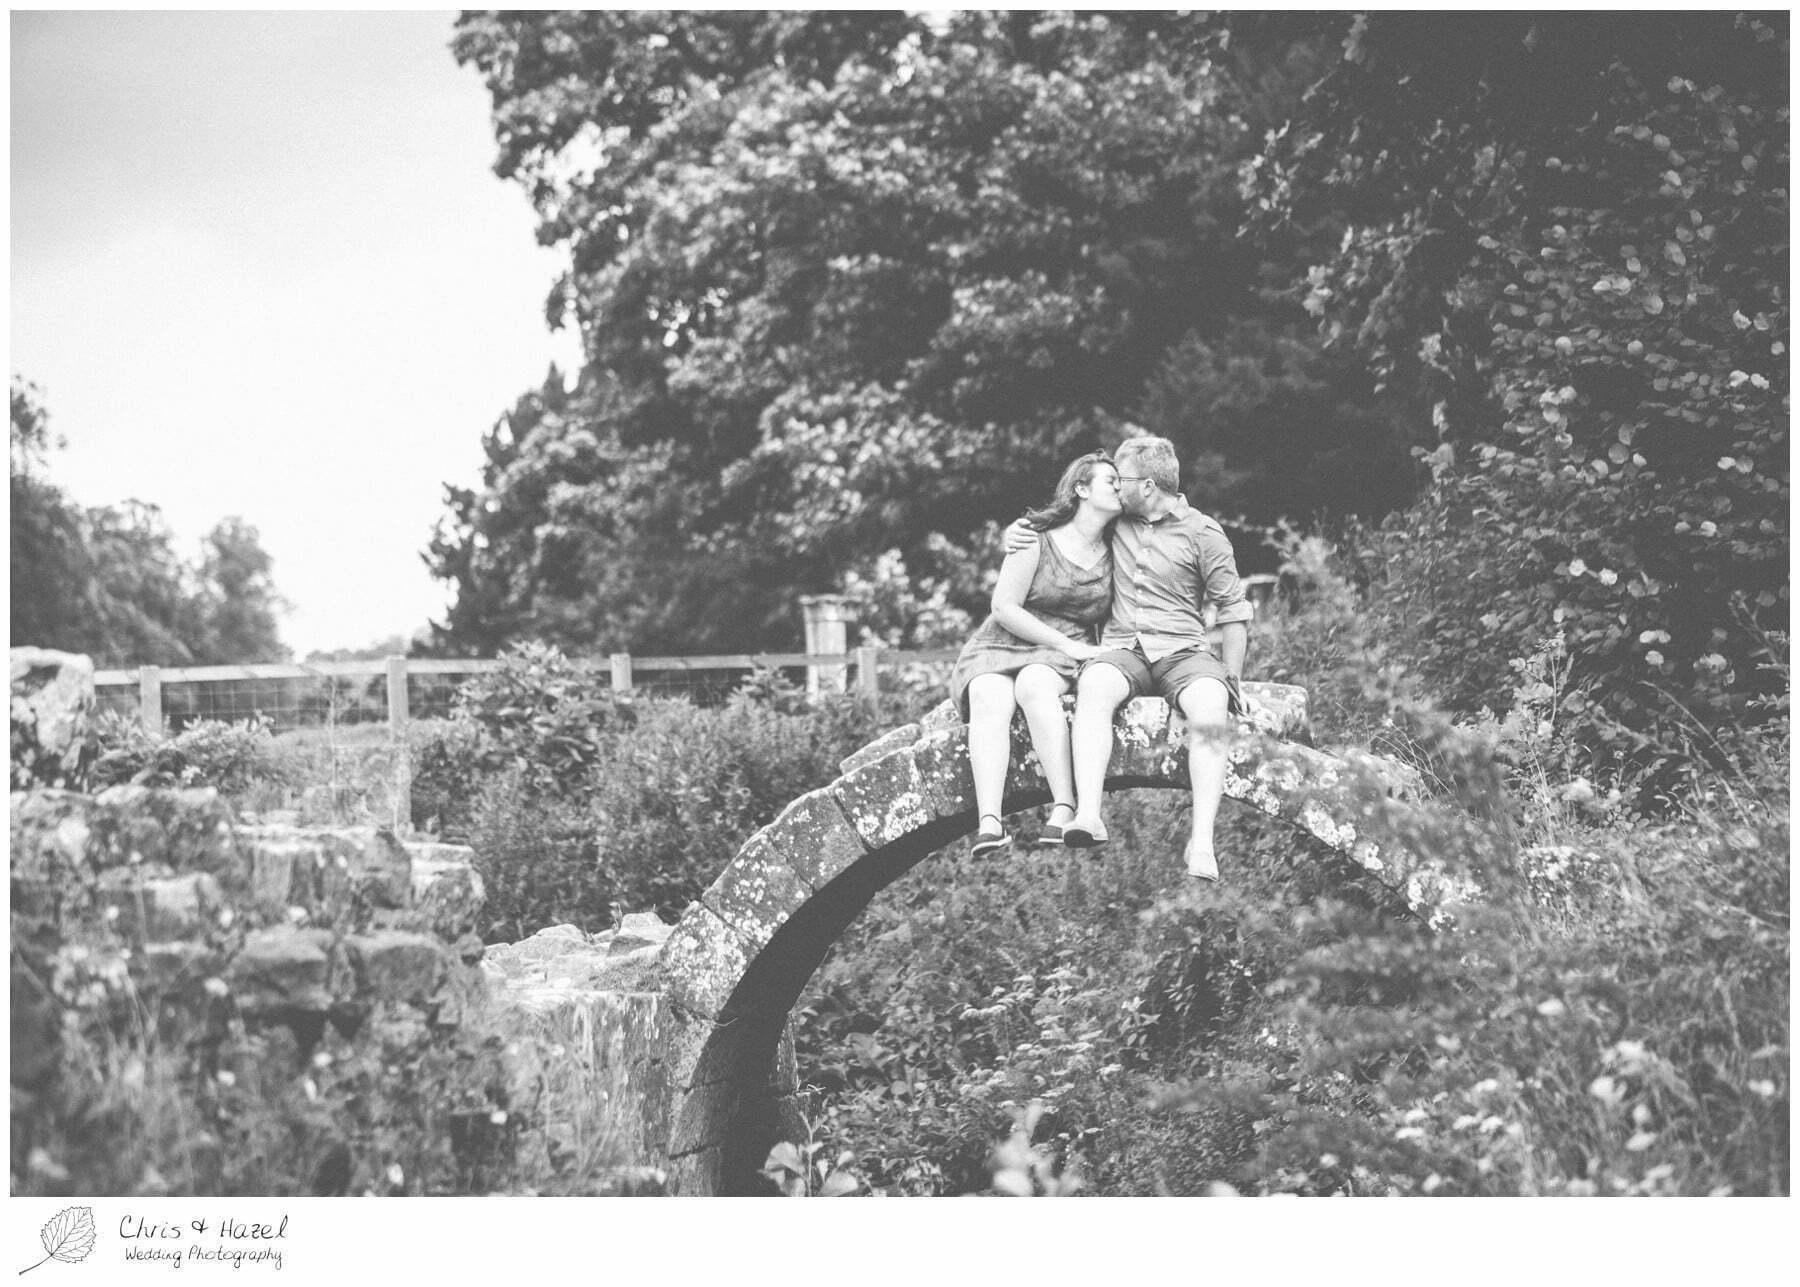 kissing bridge, engagement, dogs, Fountains abbey national trust, Rippon, Fountains Abbey, Pre Wedding Photography Yorkshire, Chris and Hazel Wedding Photography, Sam Nicholson, Emily Nunwick,